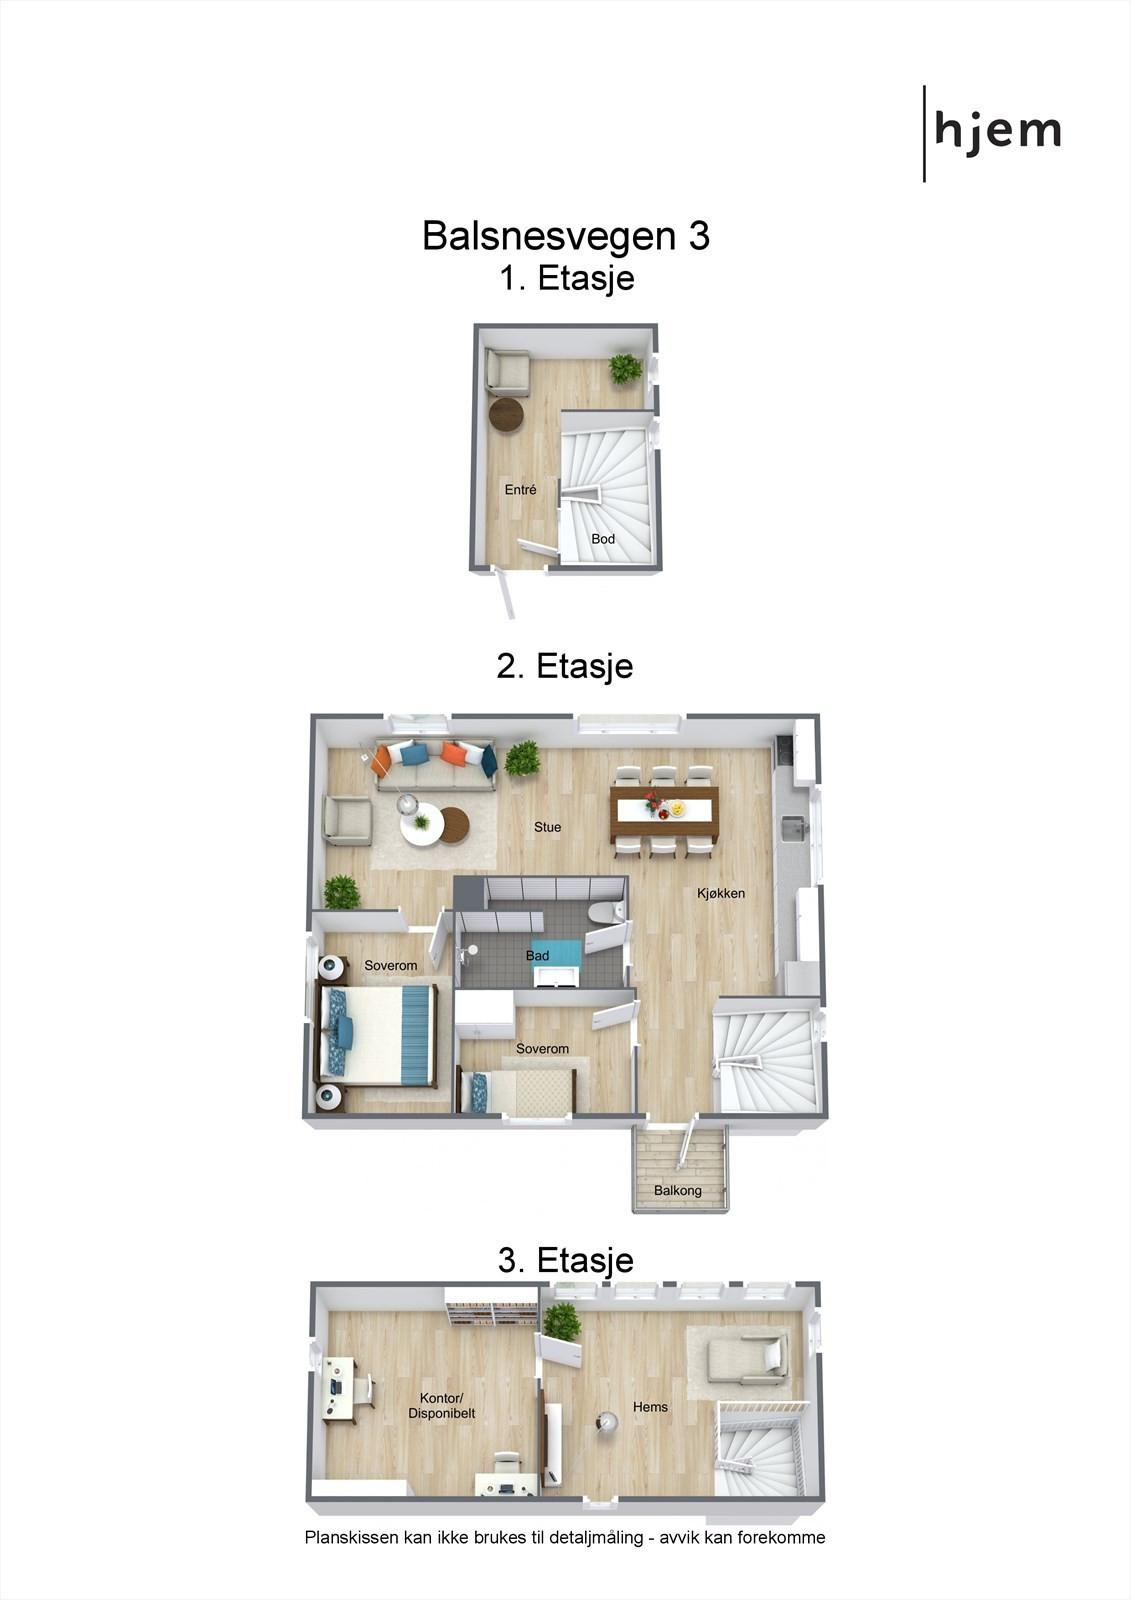 Project letterhead - Balsnesvegen 3 - 3D Floor Plan.jpg